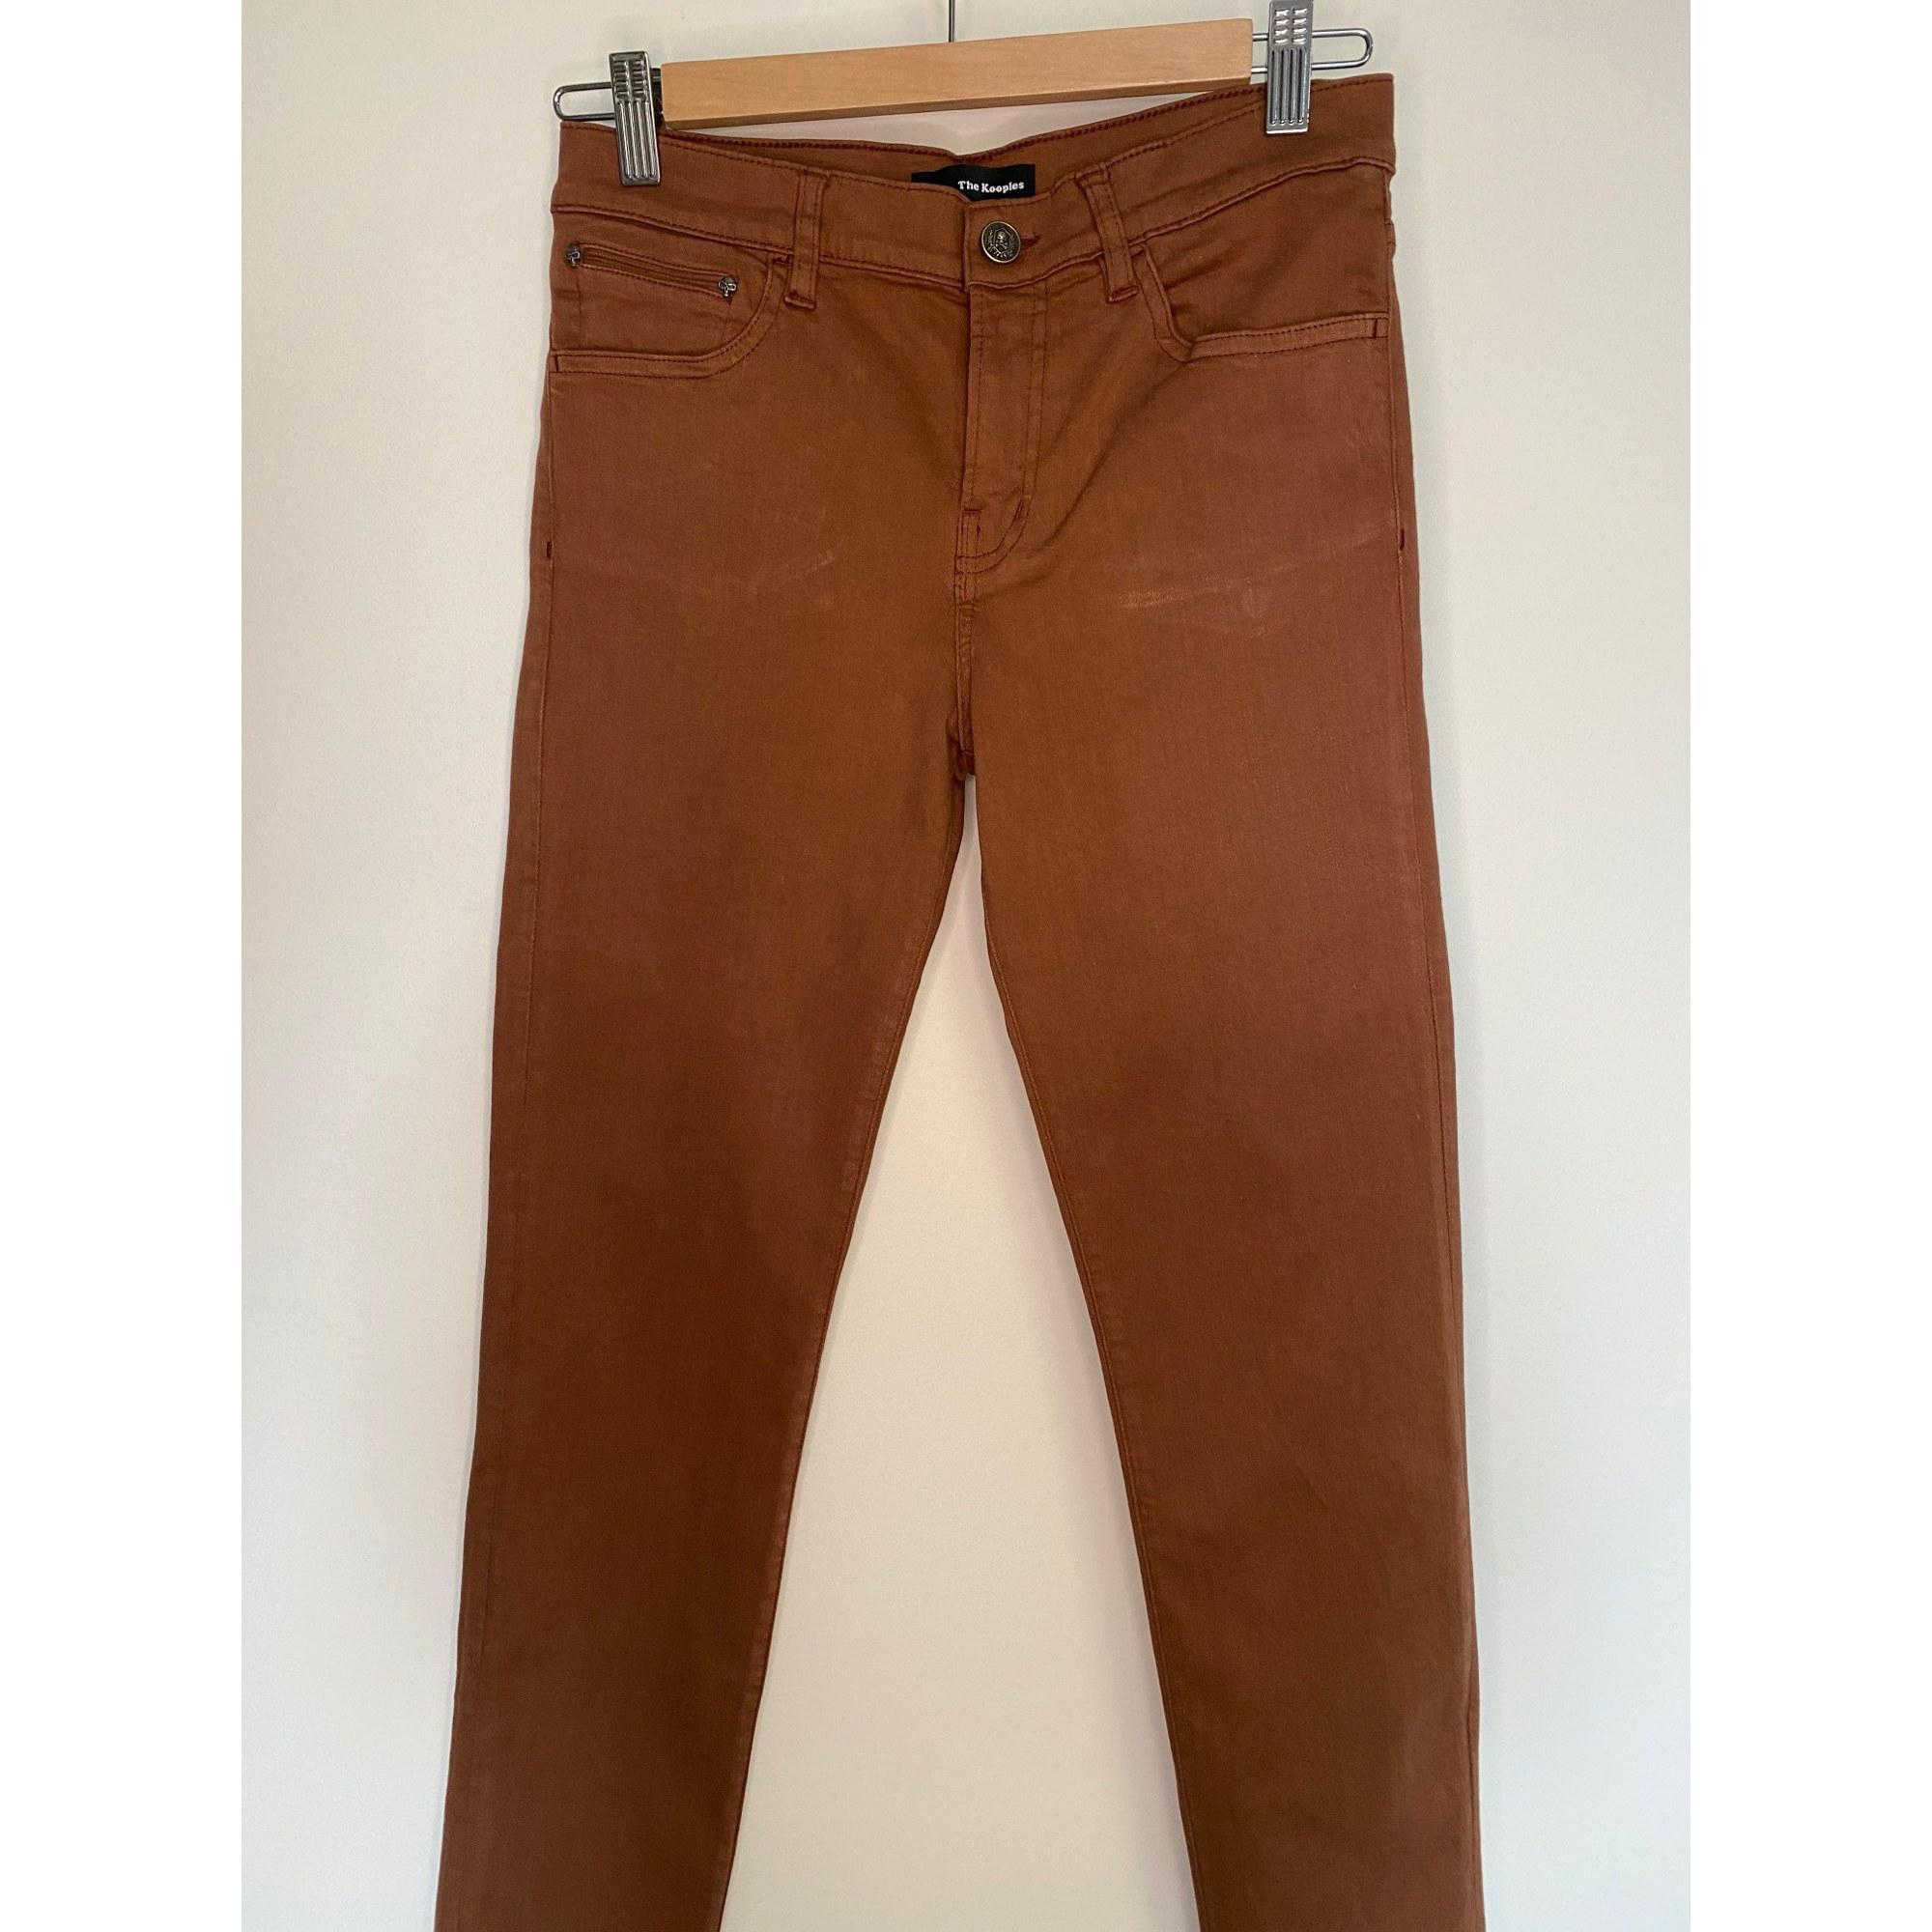 Pantalon slim, cigarette THE KOOPLES Beige, camel